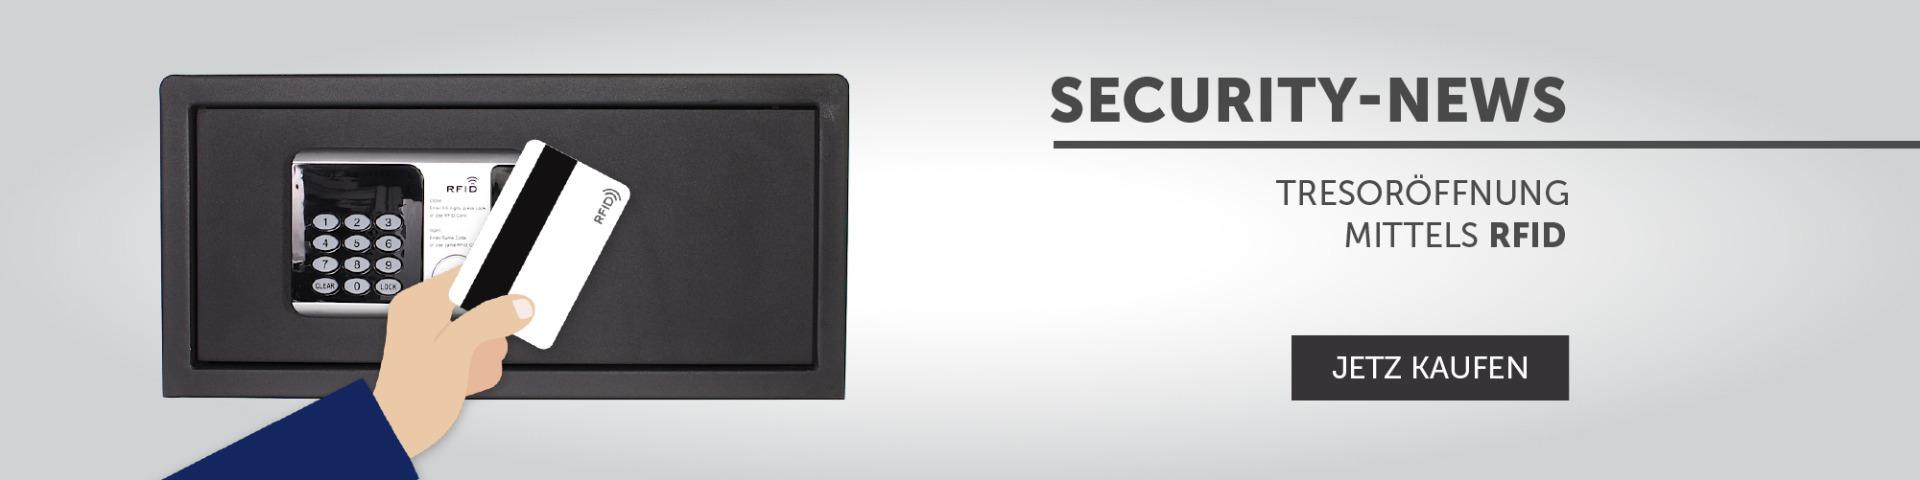 Security News - RFID Safe